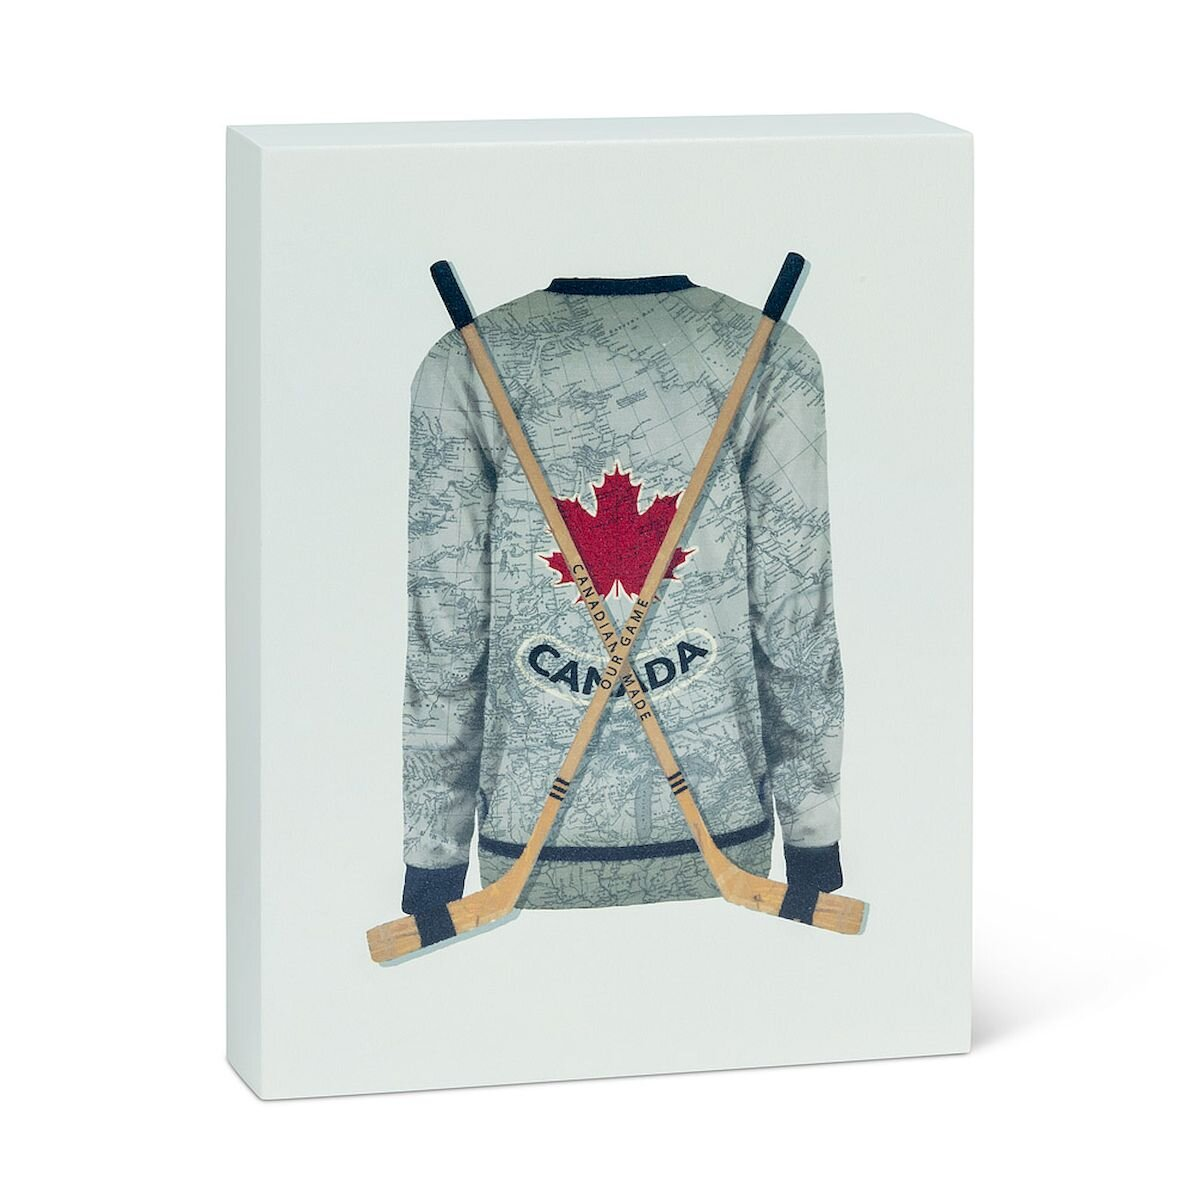 Hockey Decorative Objects You Ll Love In 2021 Wayfair